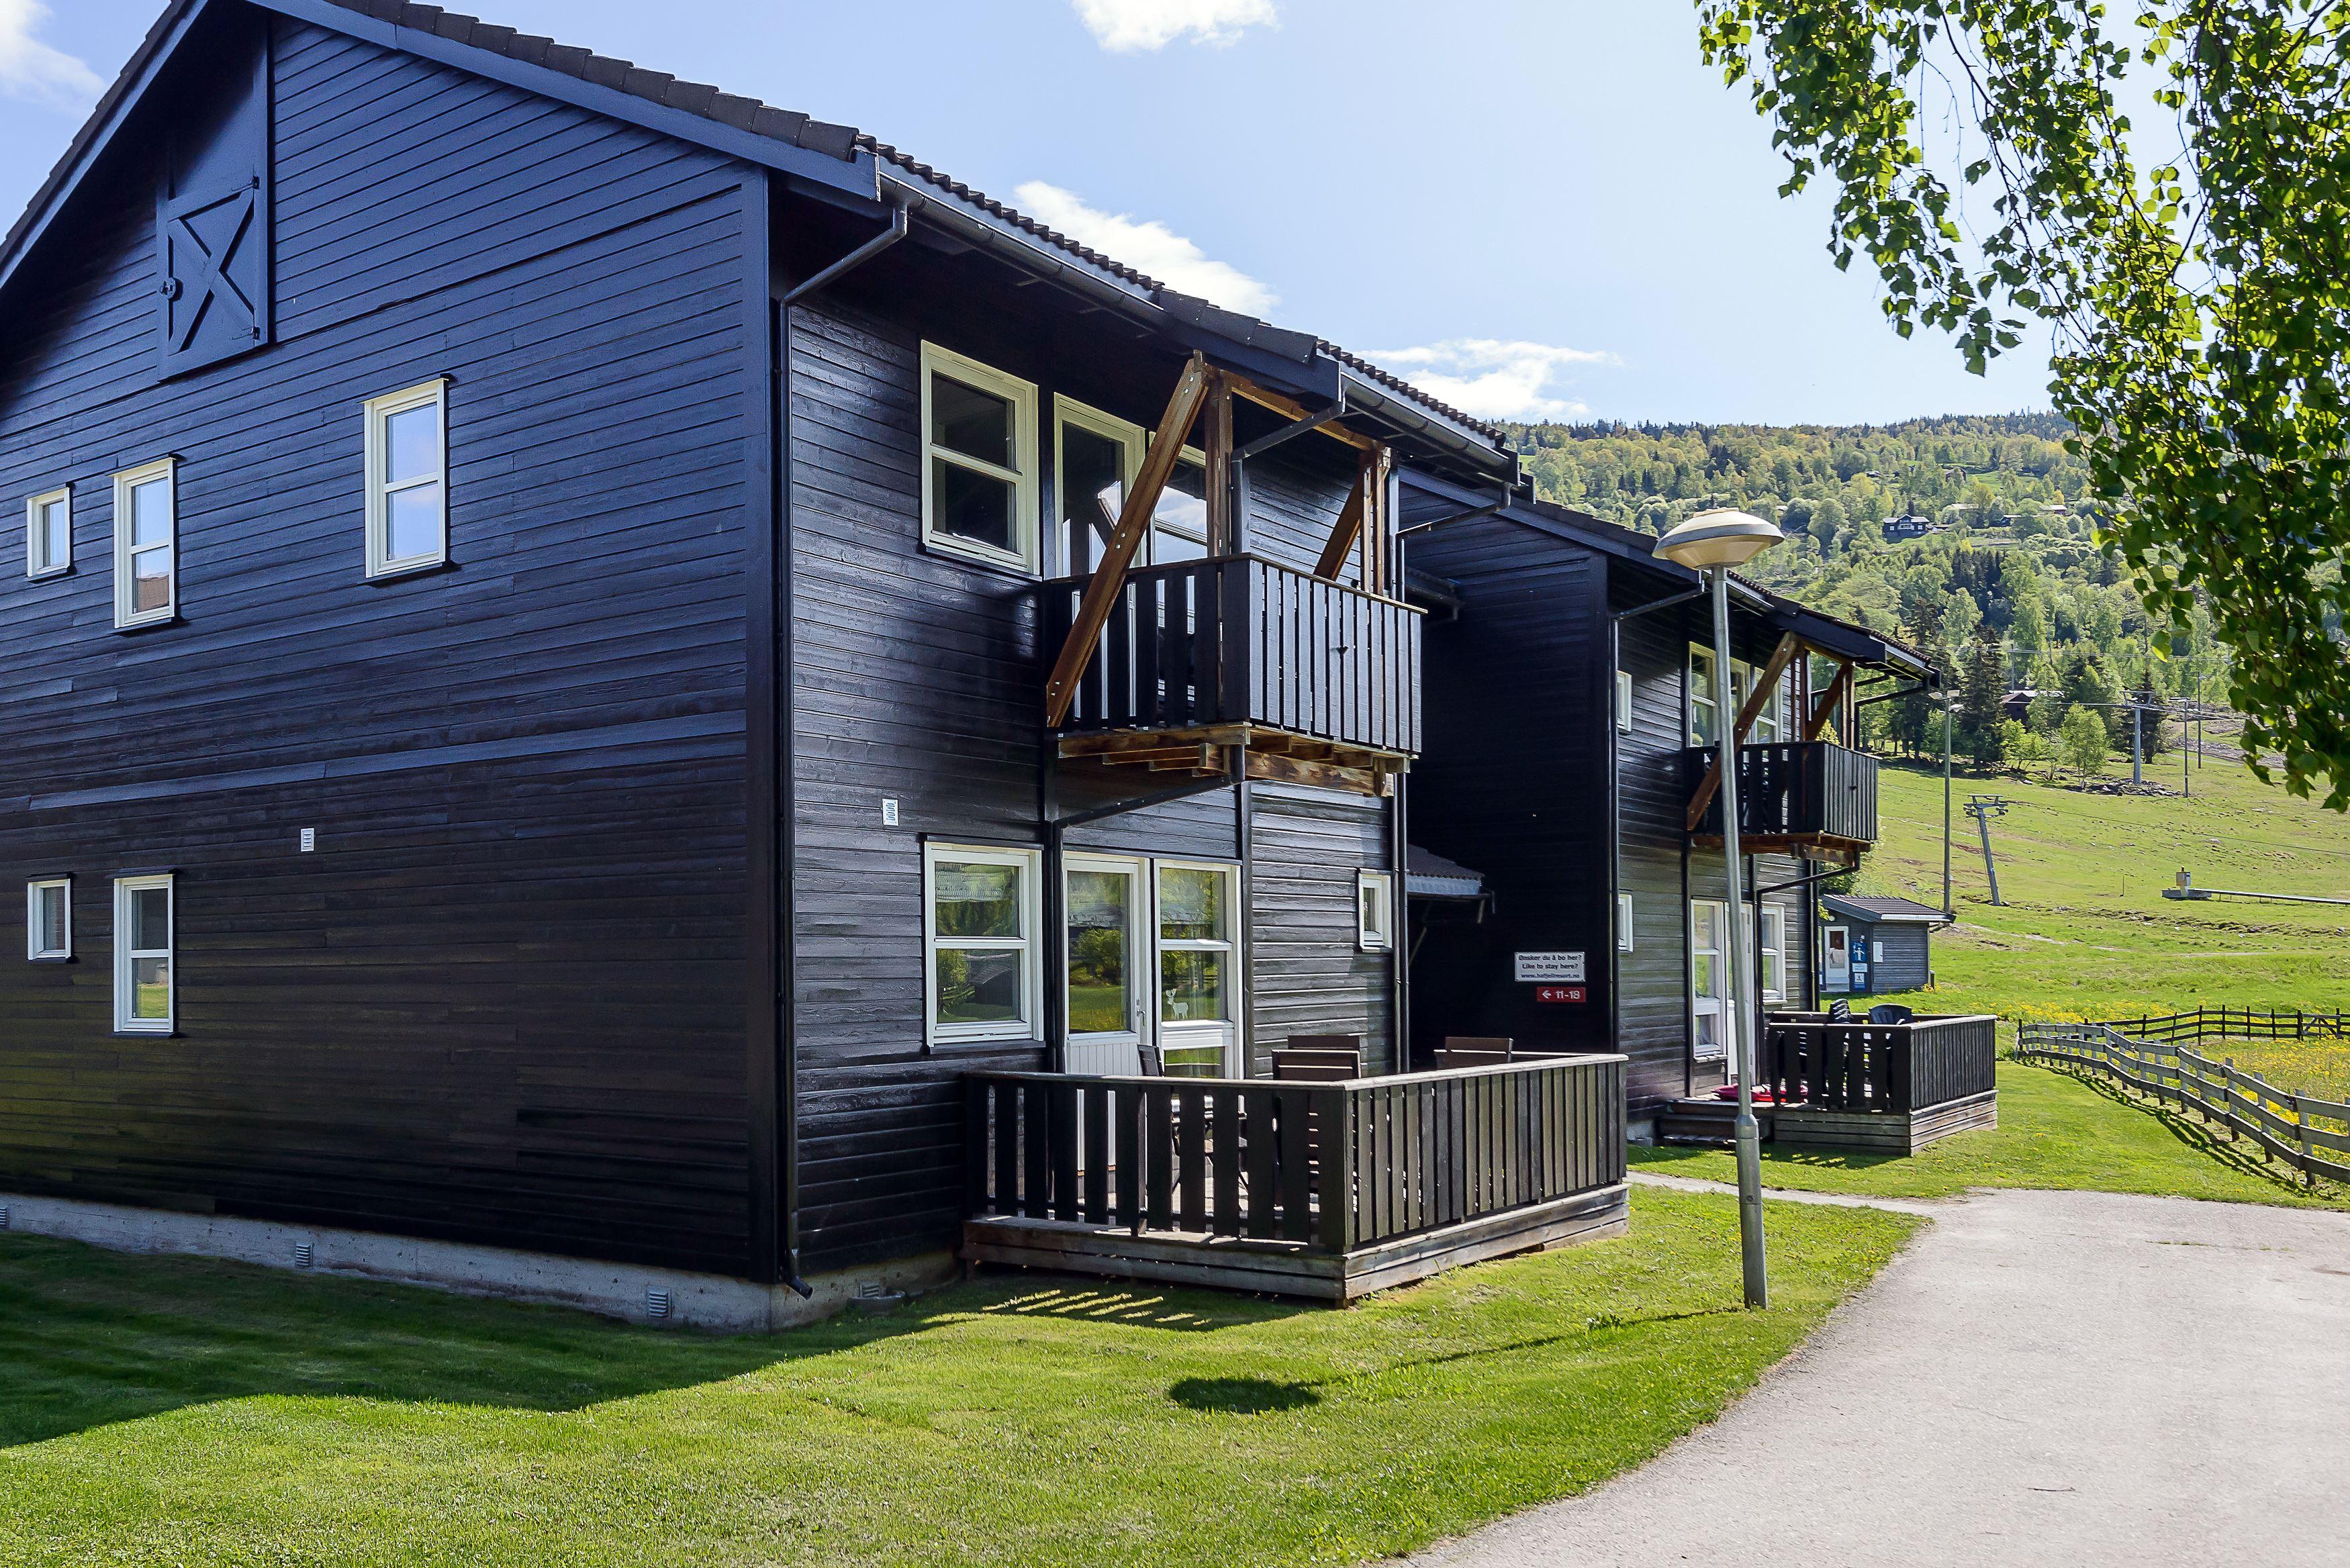 Hafjell Alpinlandsby nr. 11